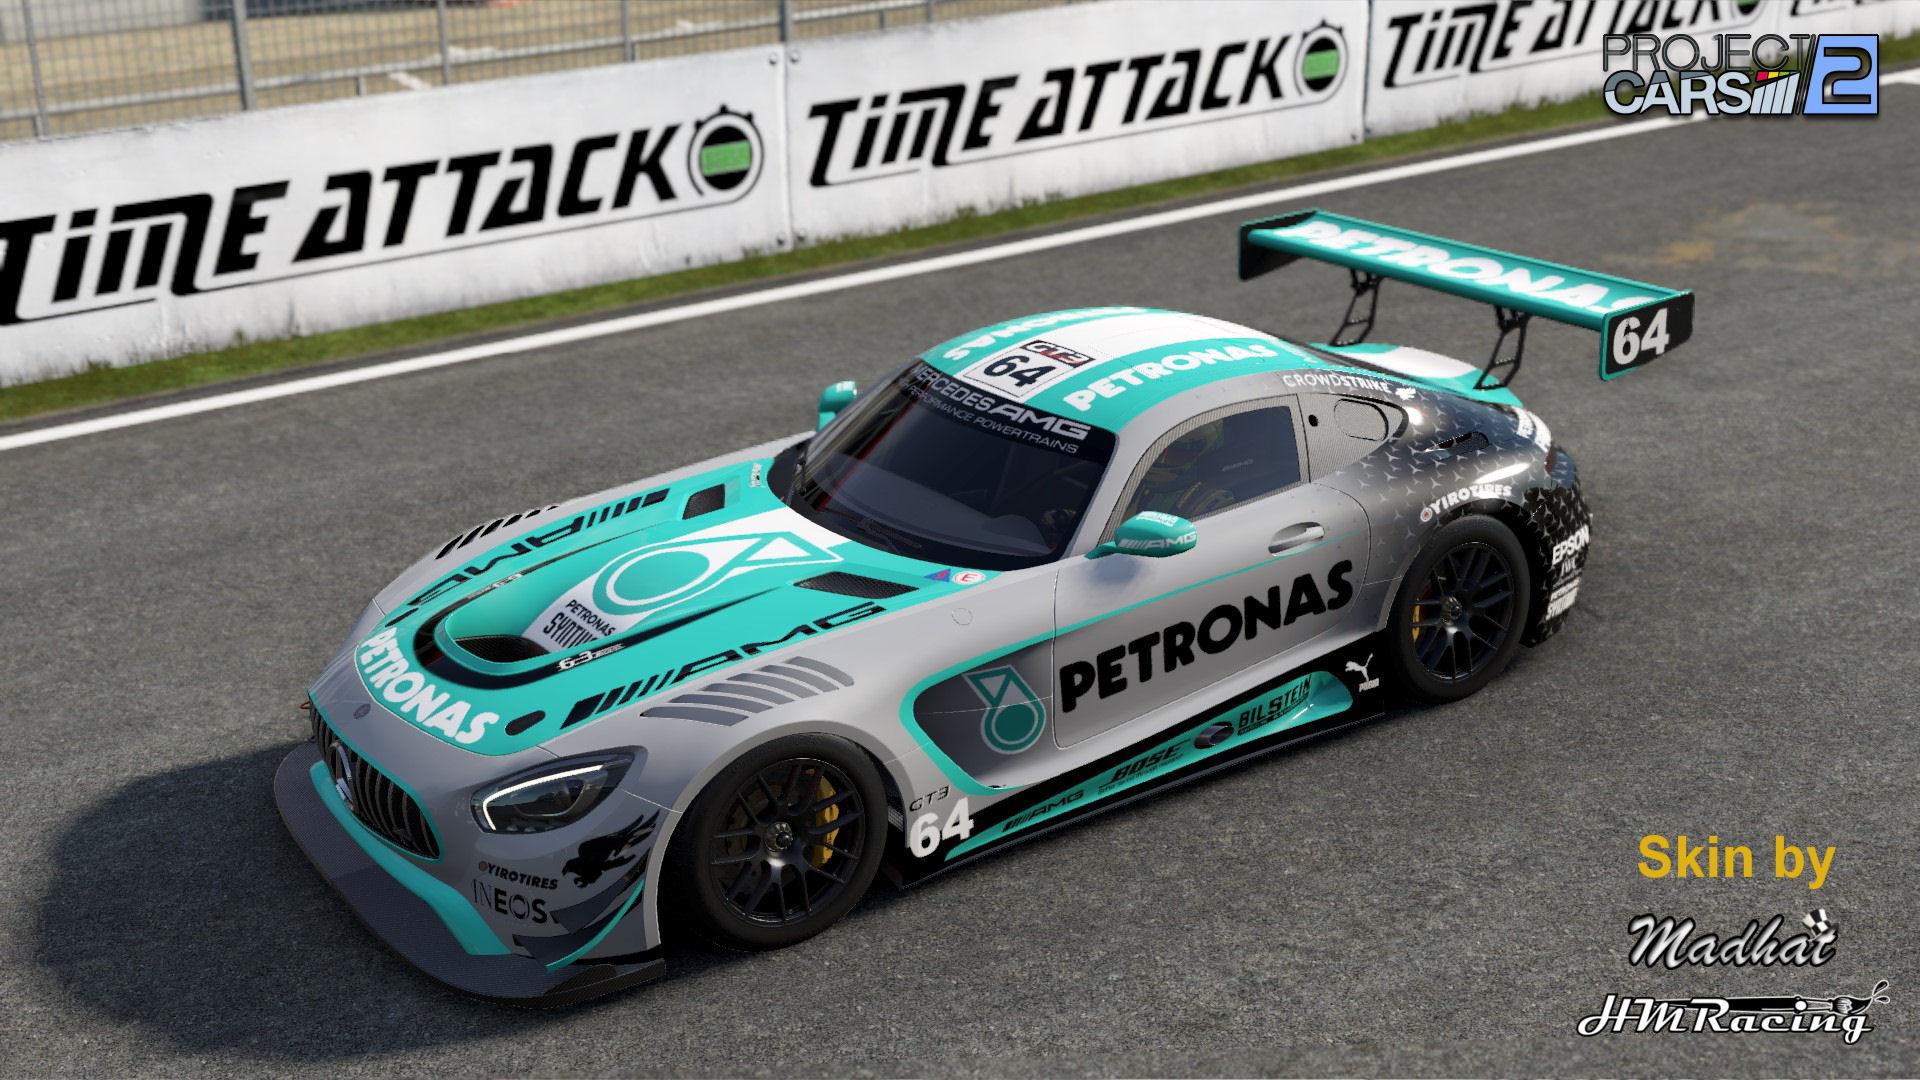 Mercedes AMG GT3 Petronas 01.jpg